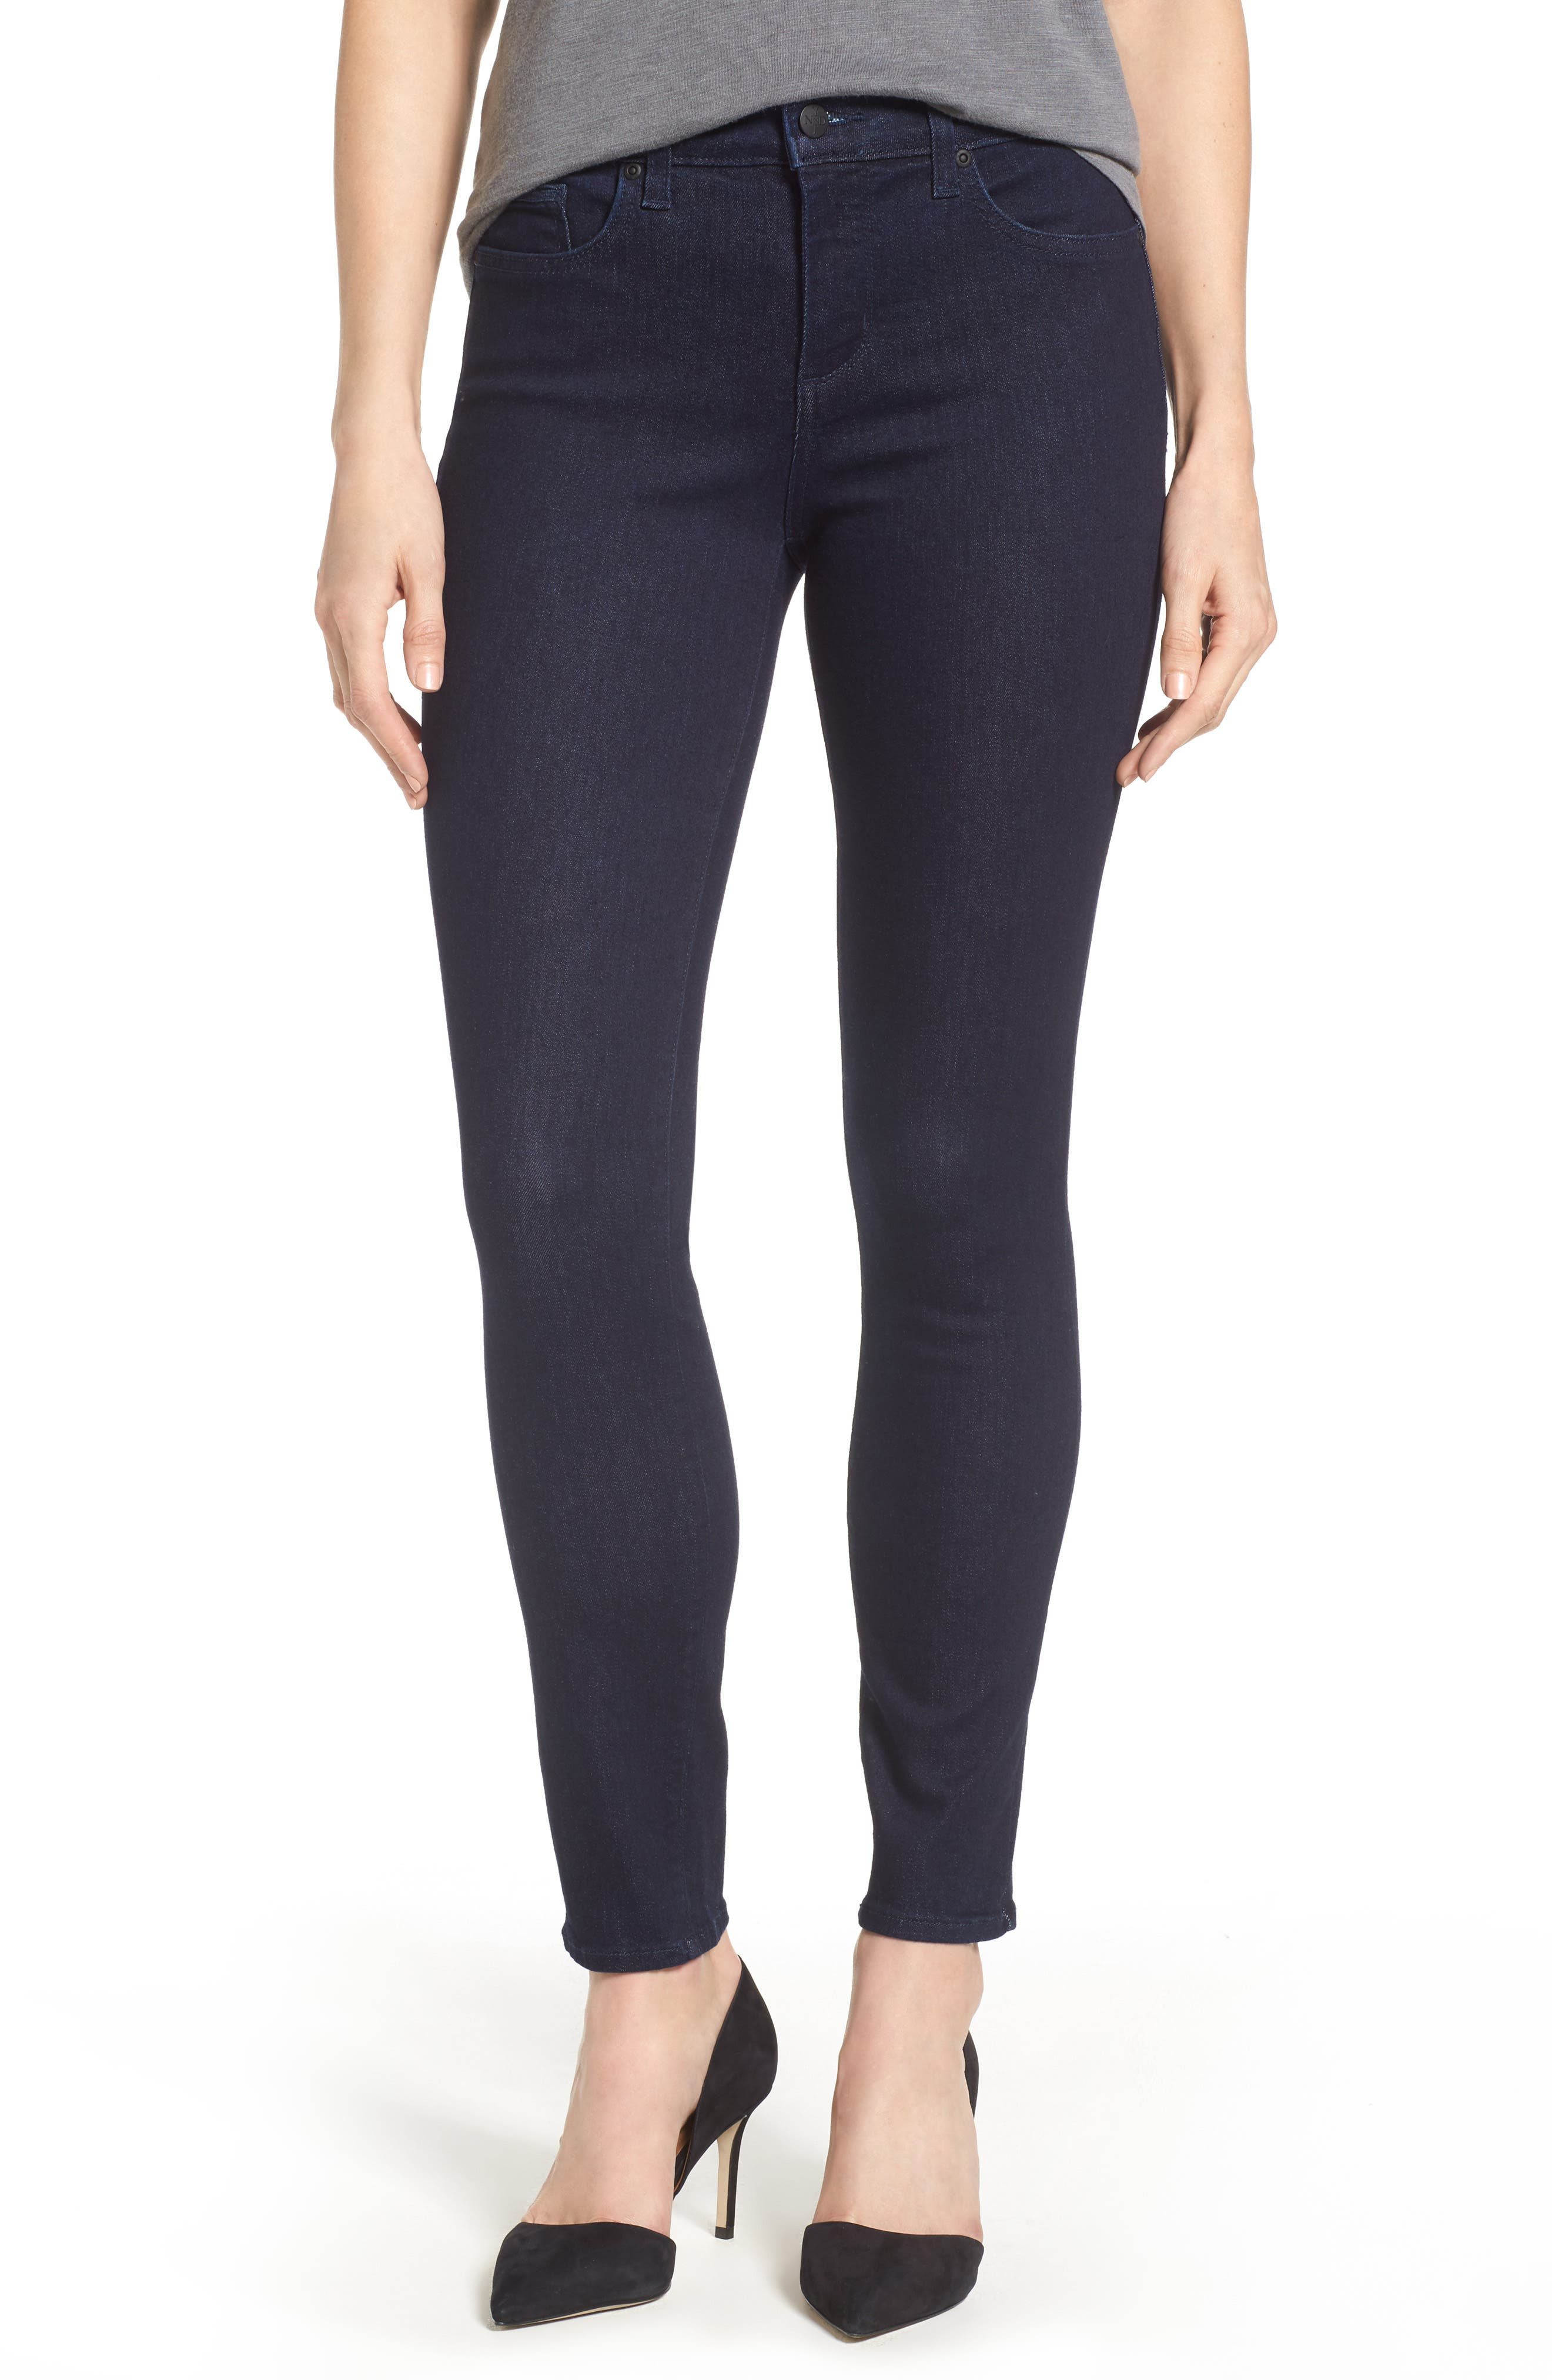 Main Image - NYDJ Ami Stretch Skinny Jeans (Rinse) (Regular & Petite)